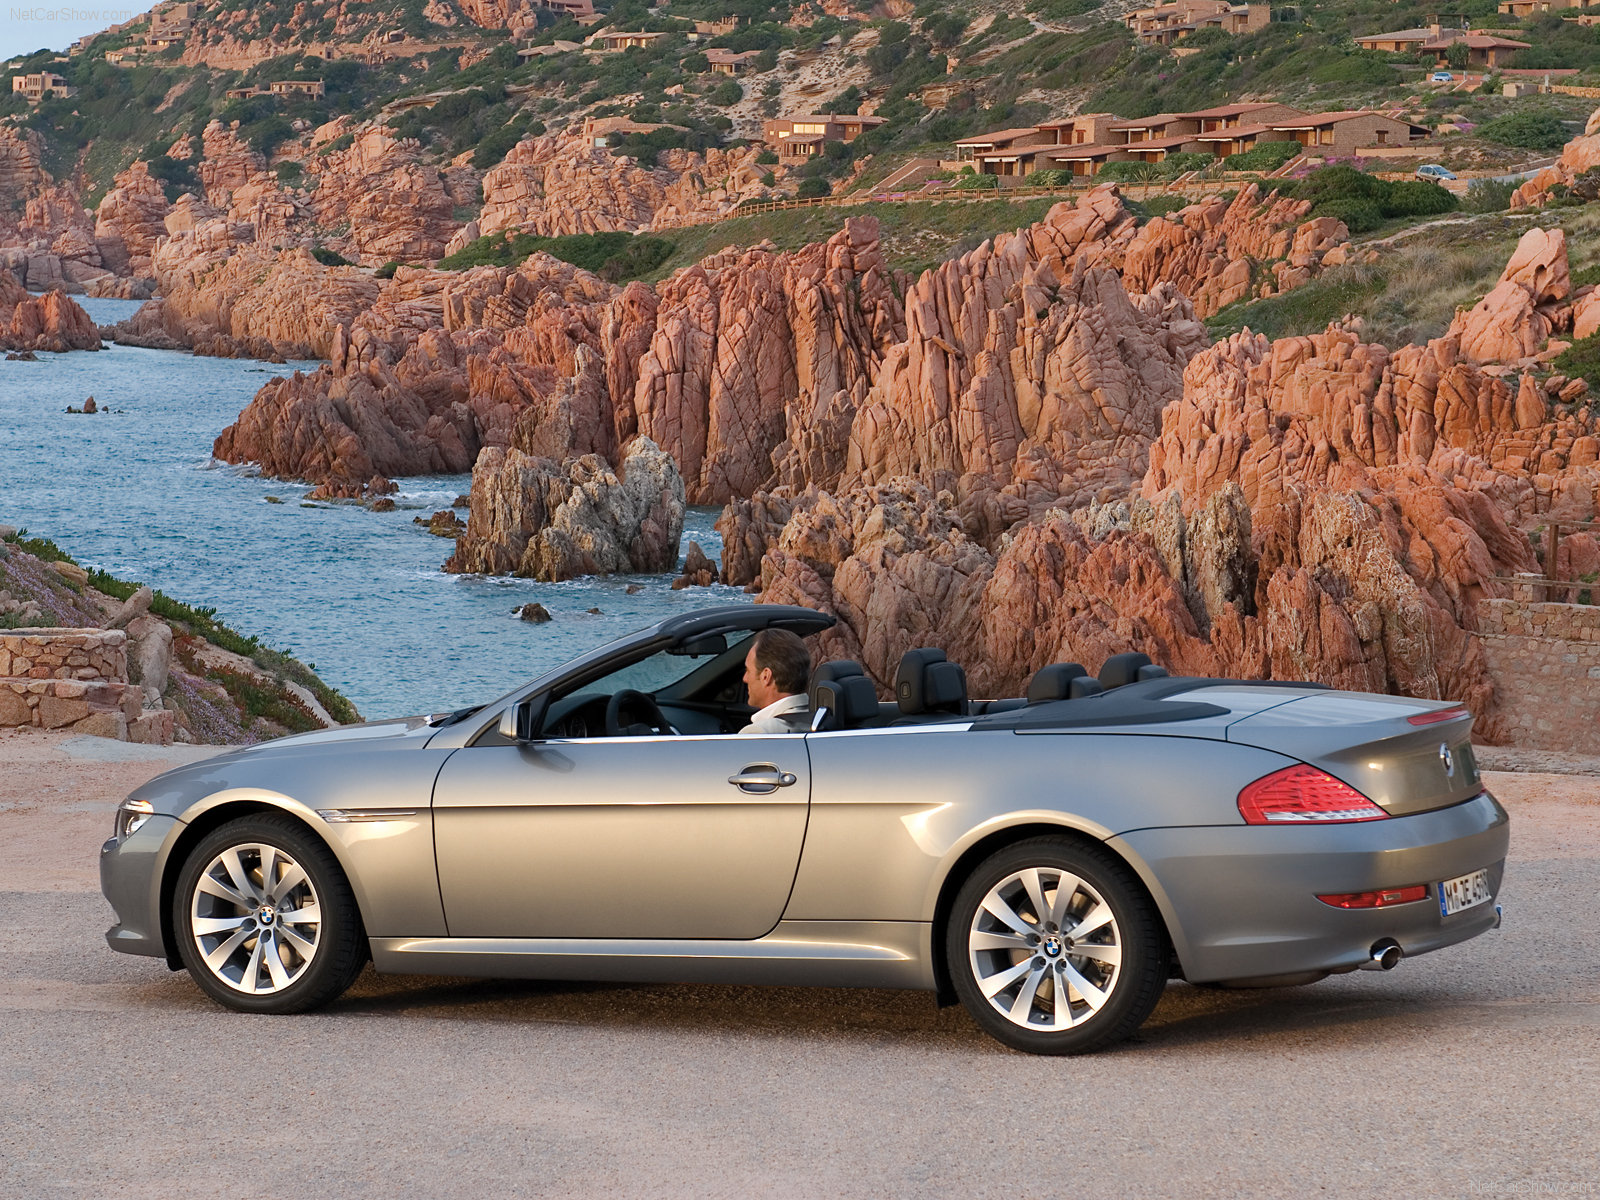 BMW 6-series E64 Convertible photo 45092